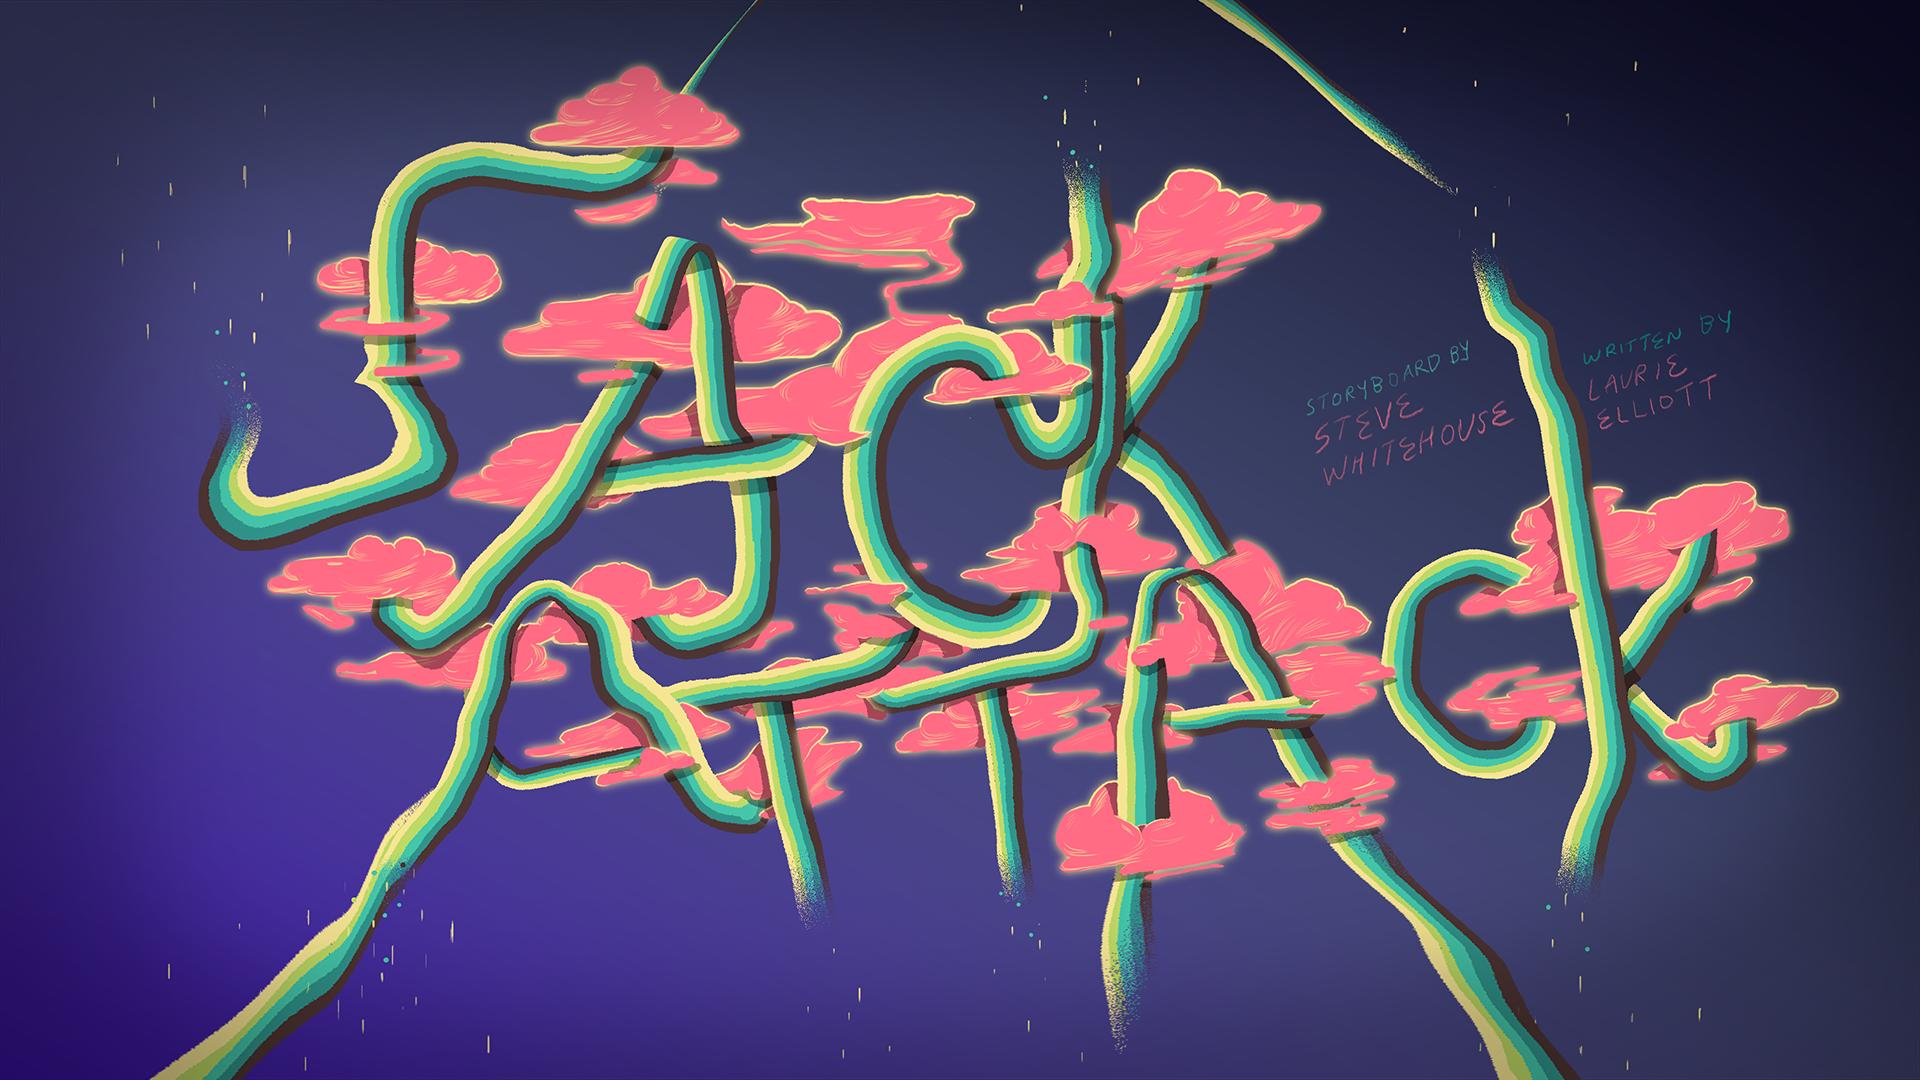 azjin_sackattack